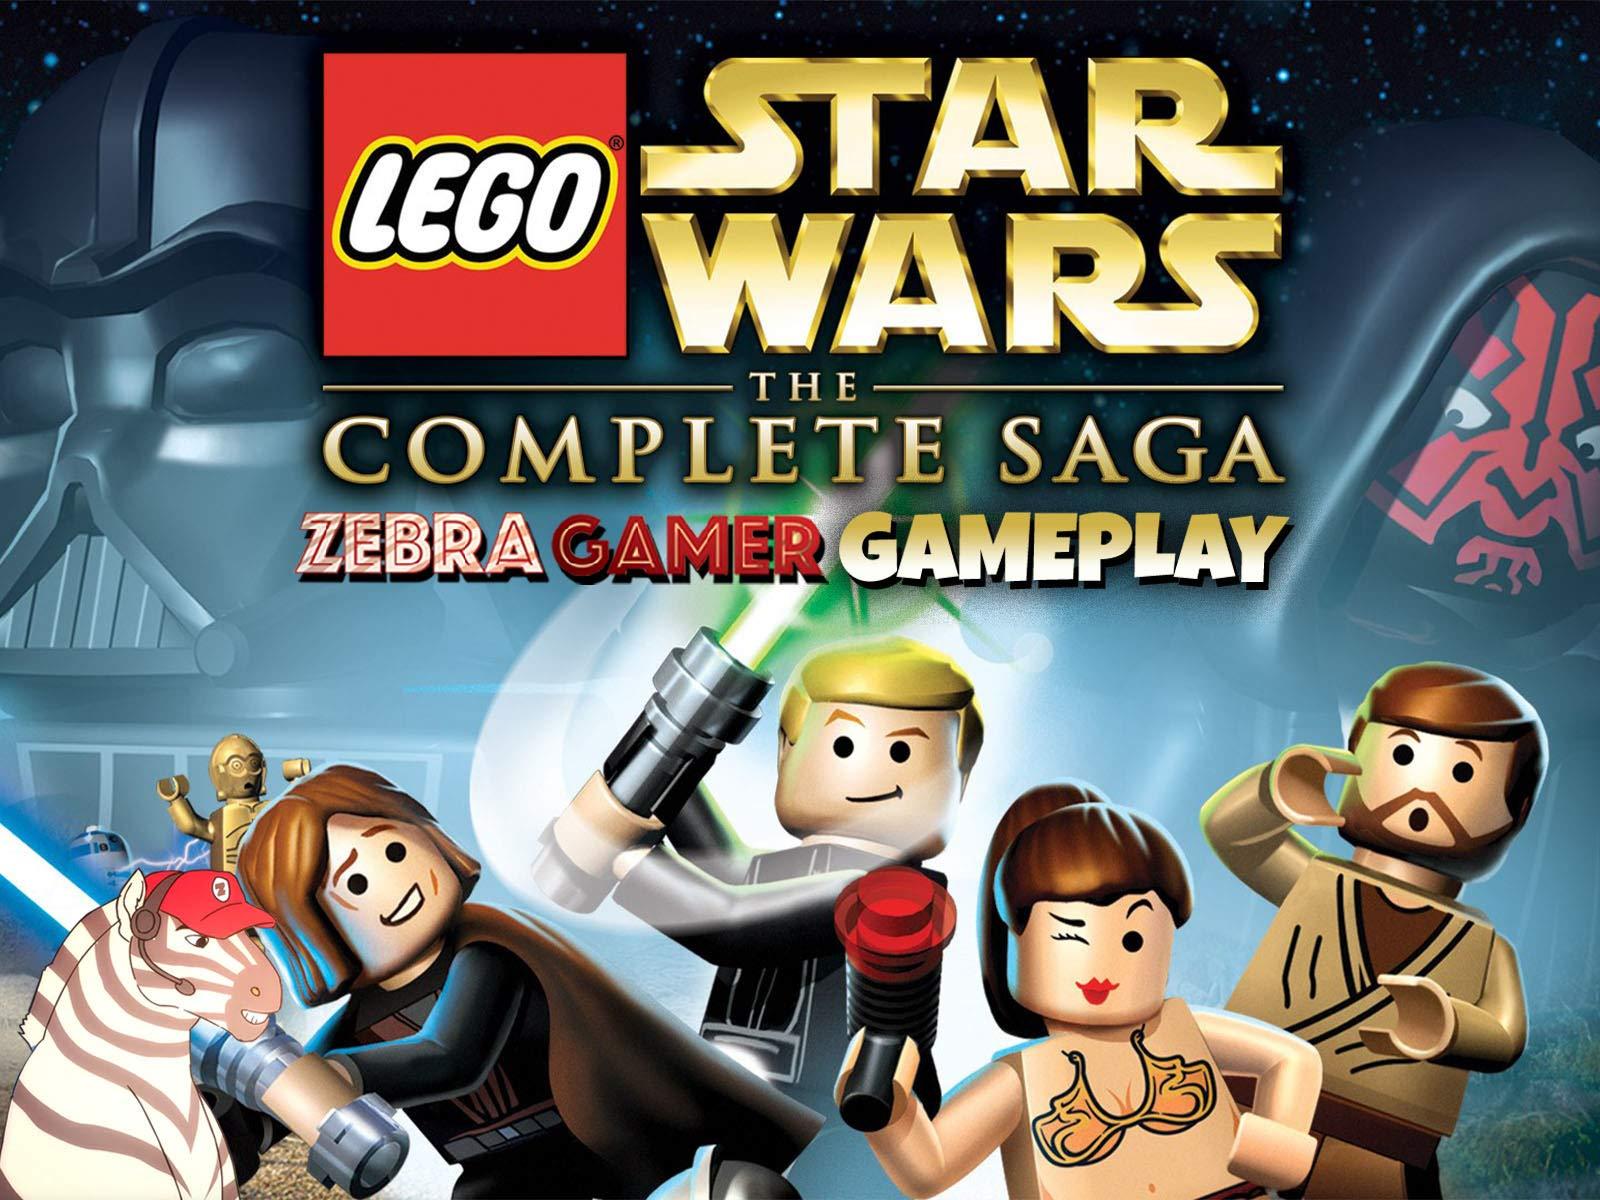 Clip: Lego Star Wars The Complete Saga Gameplay - Zebra Gamer - Season 1